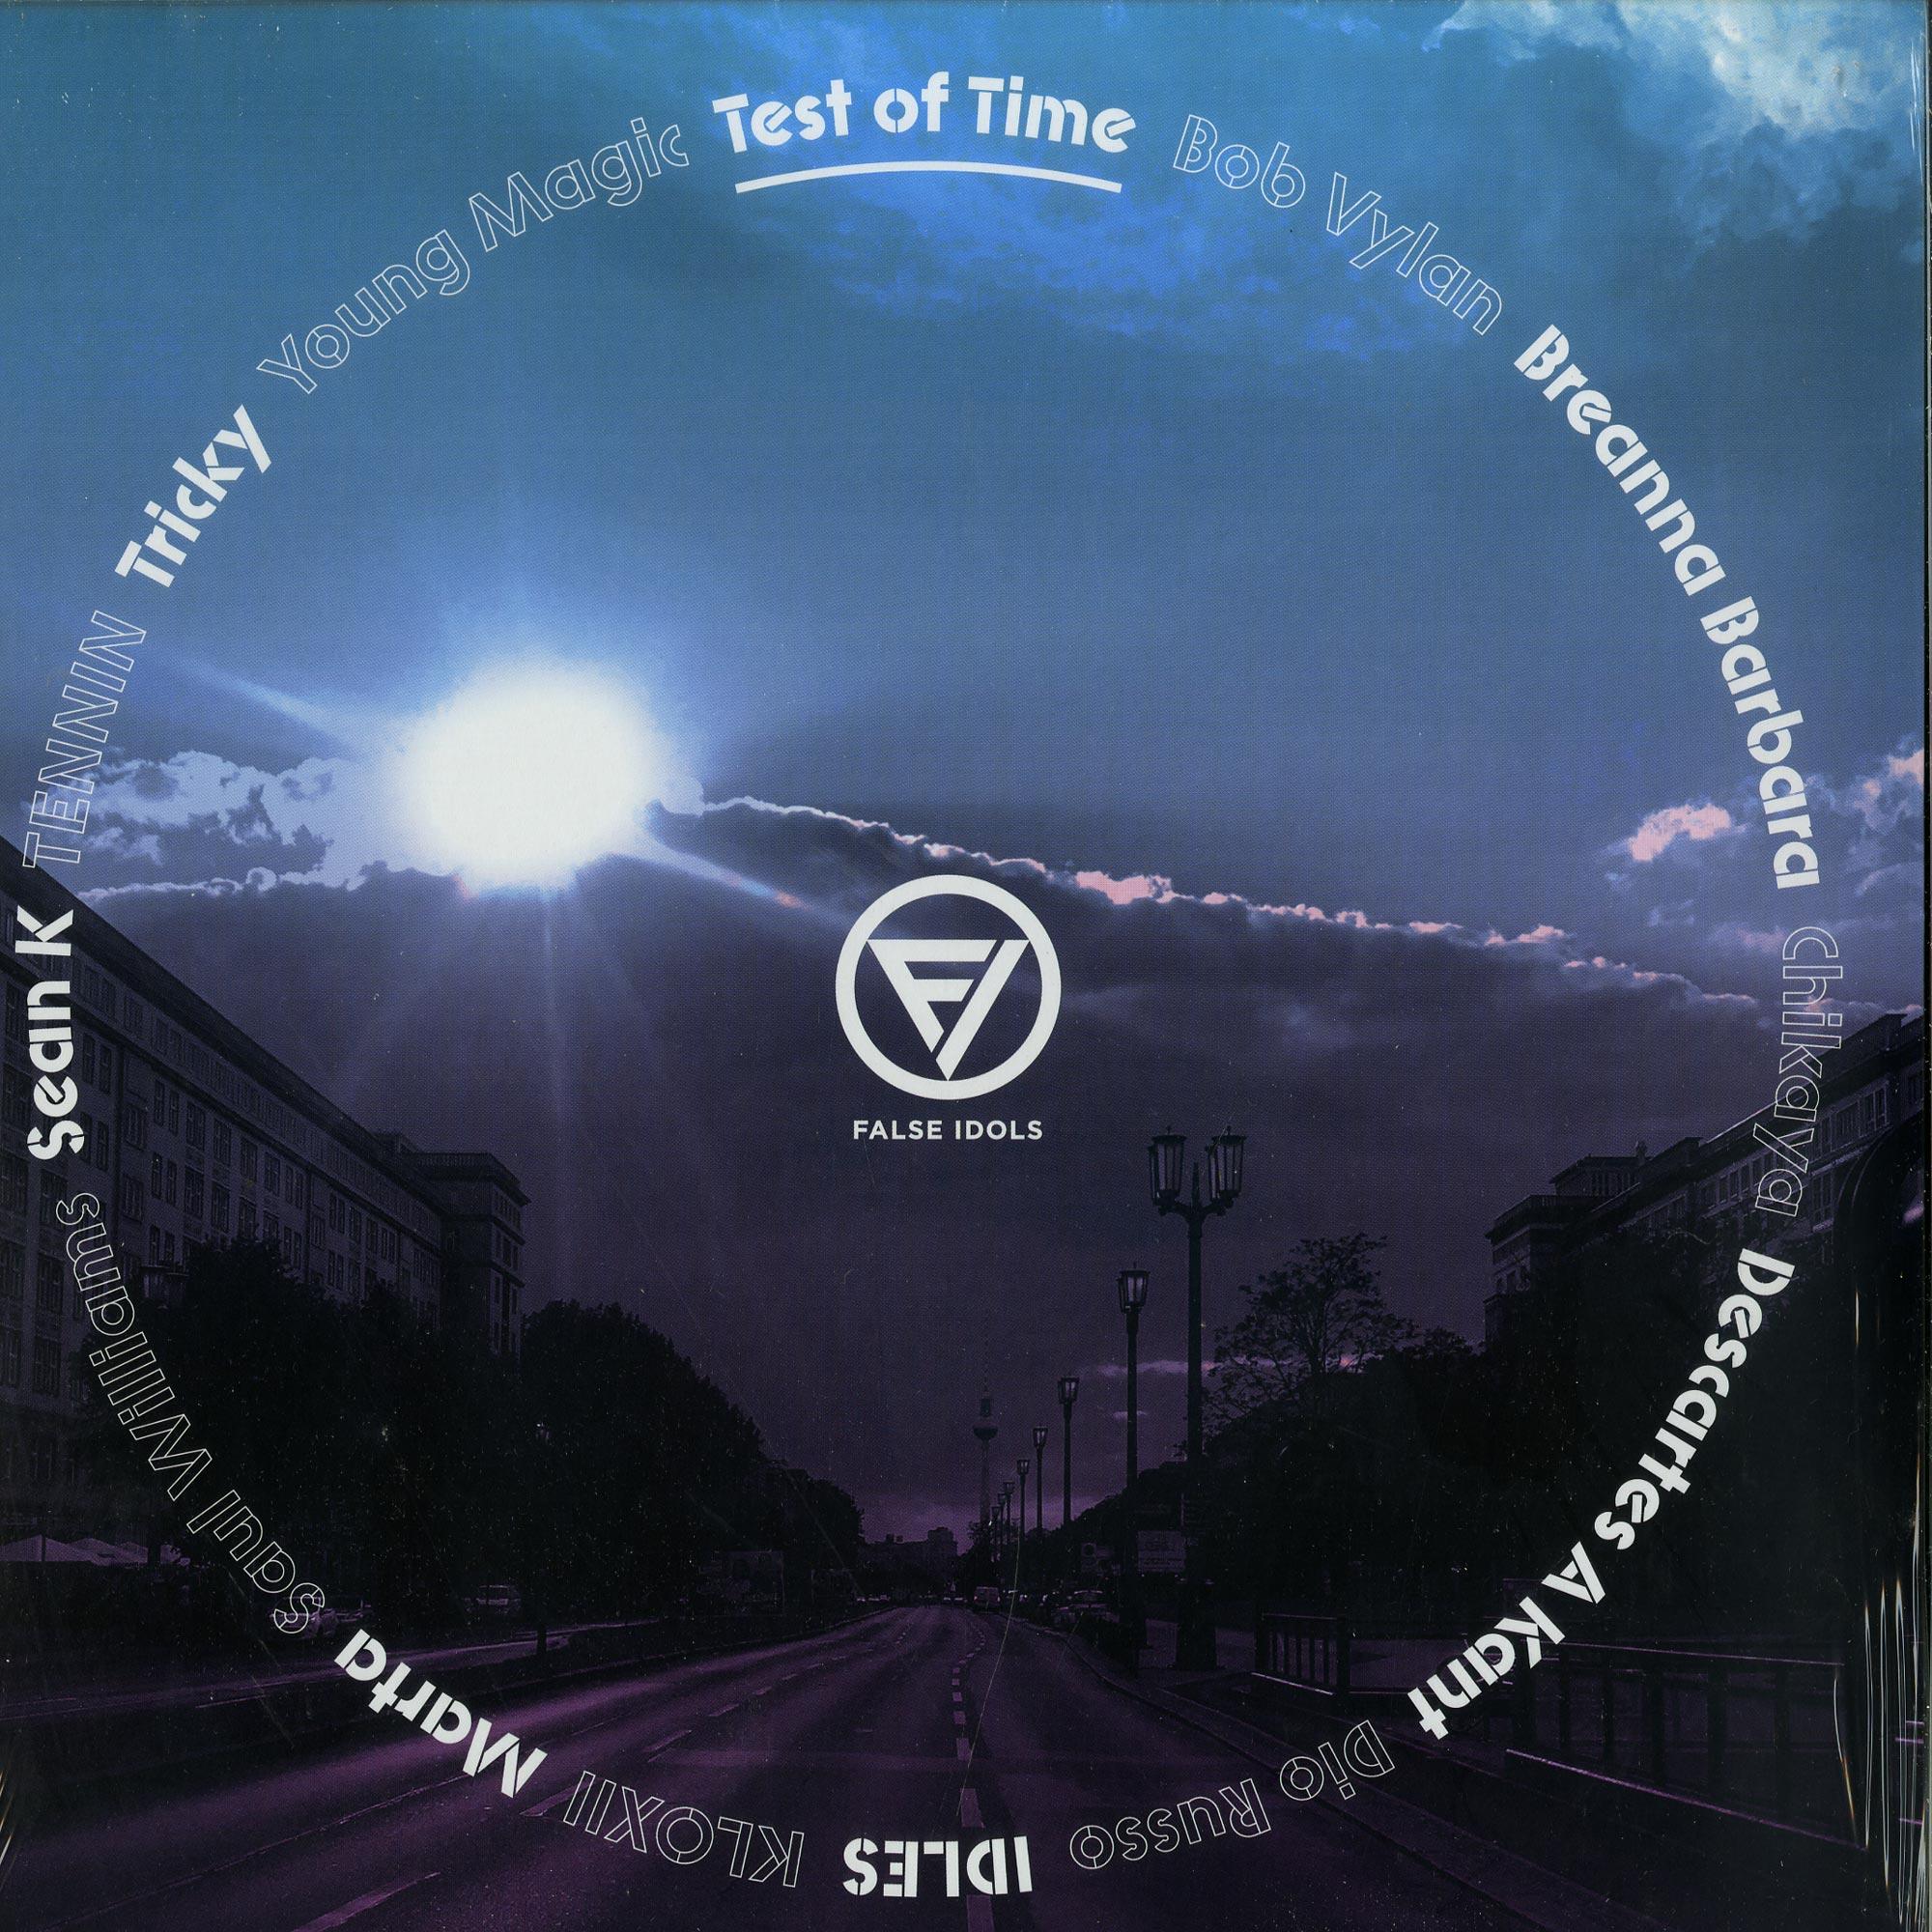 False Idols - TEST OF TIME